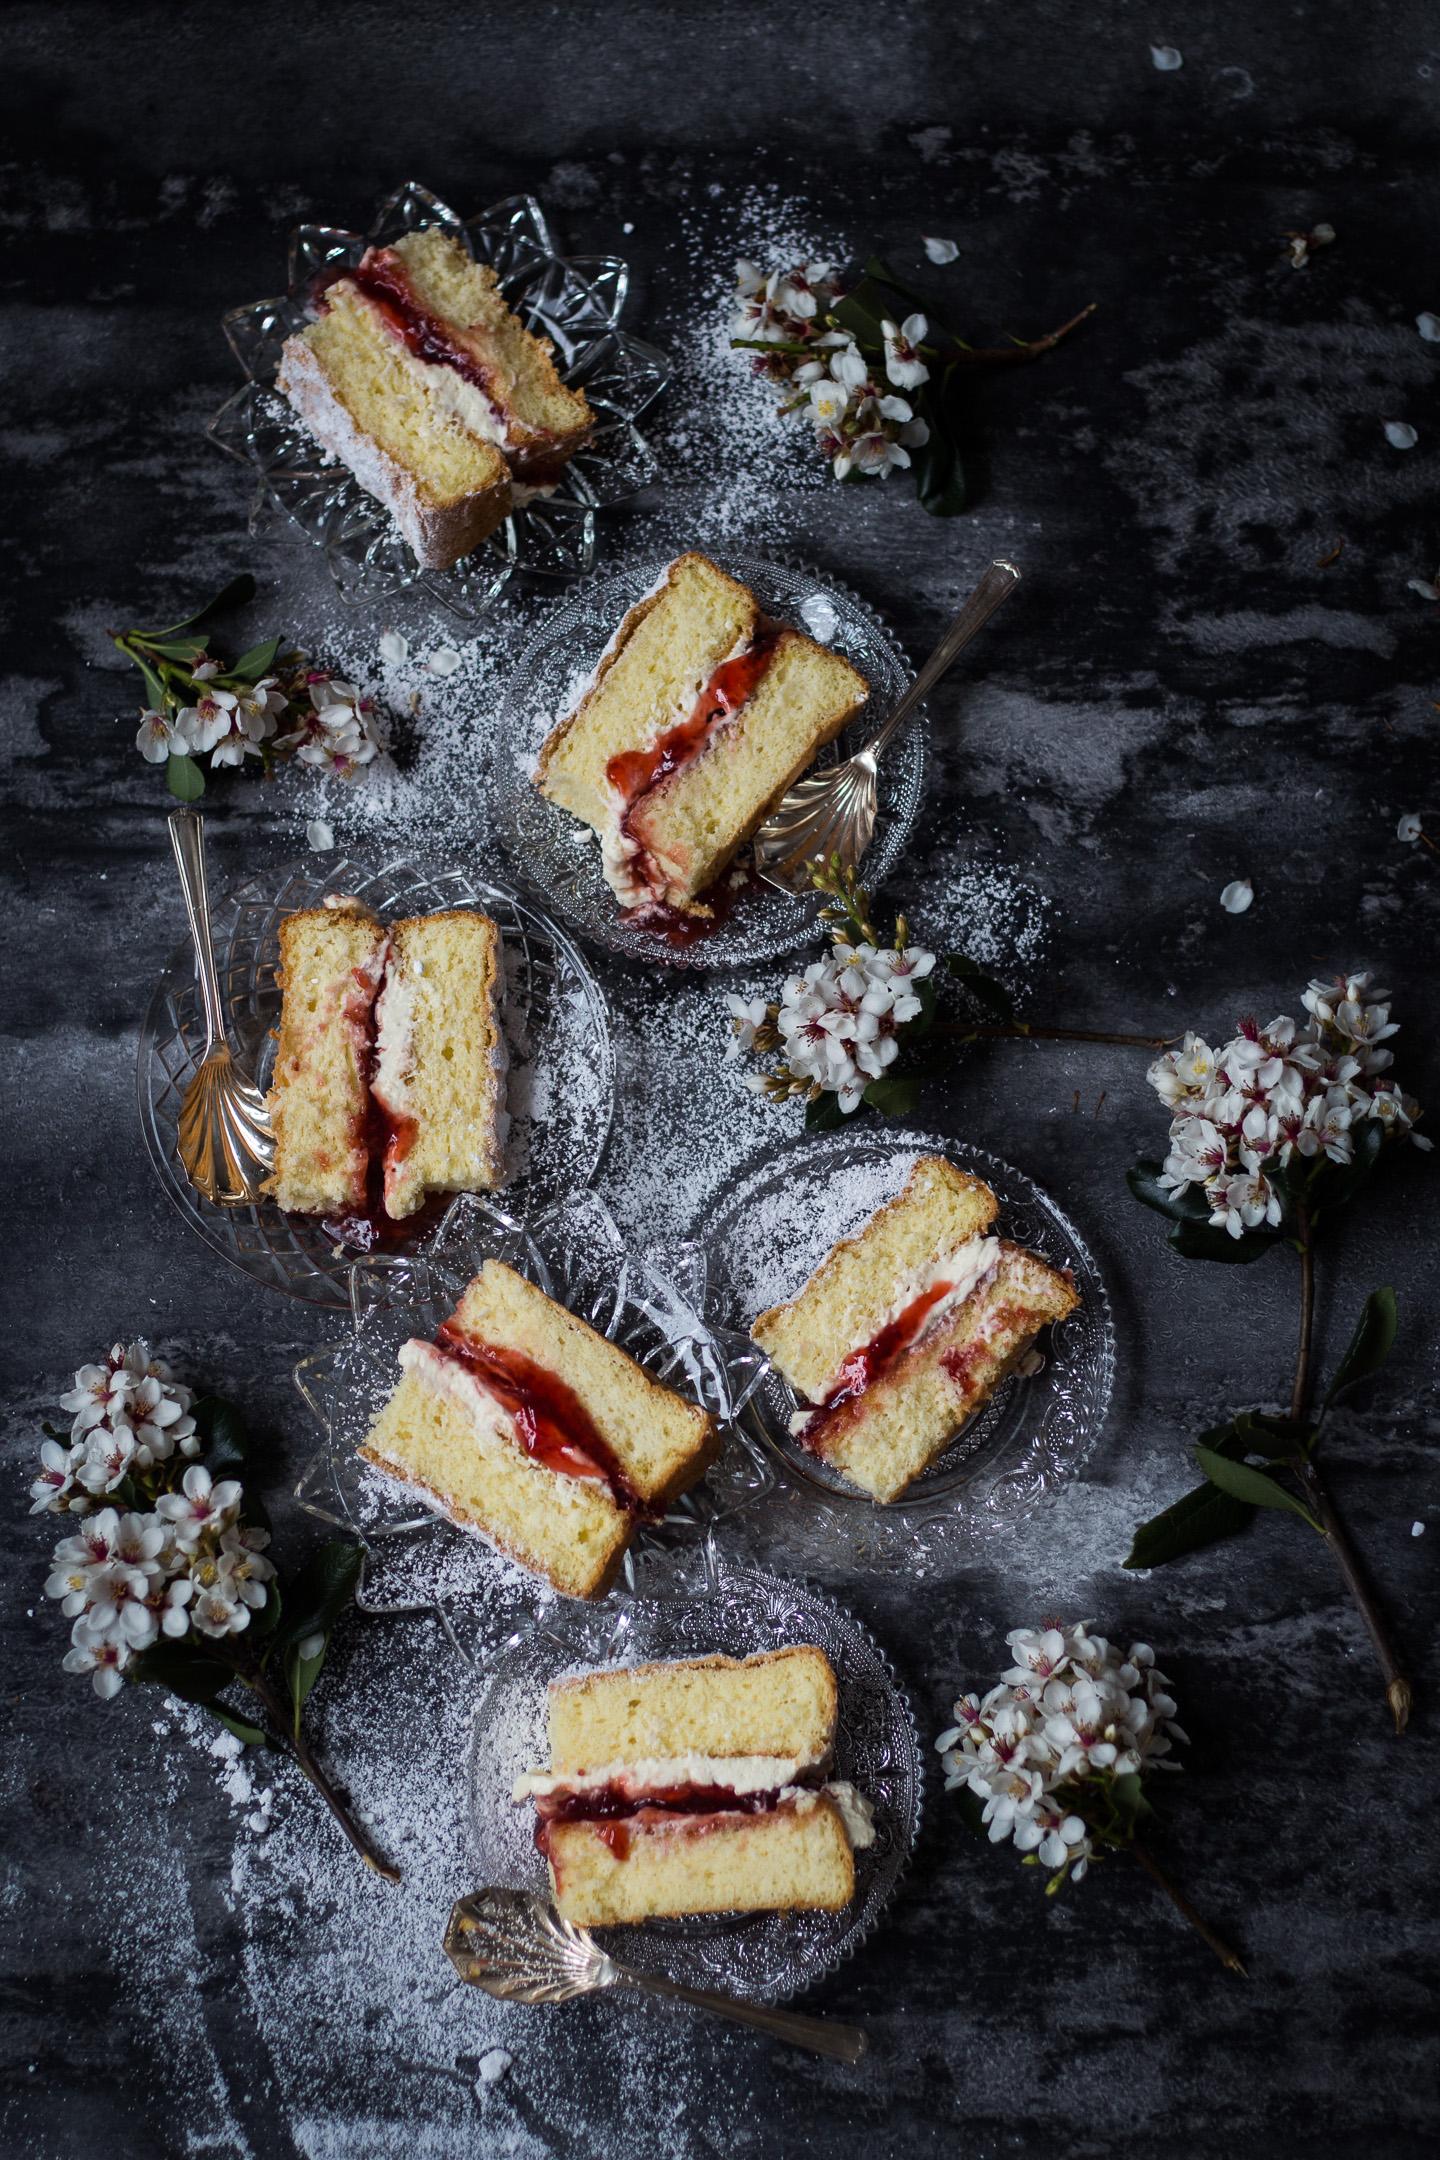 victorian-sponge-cake-gluten-free-recipe-5